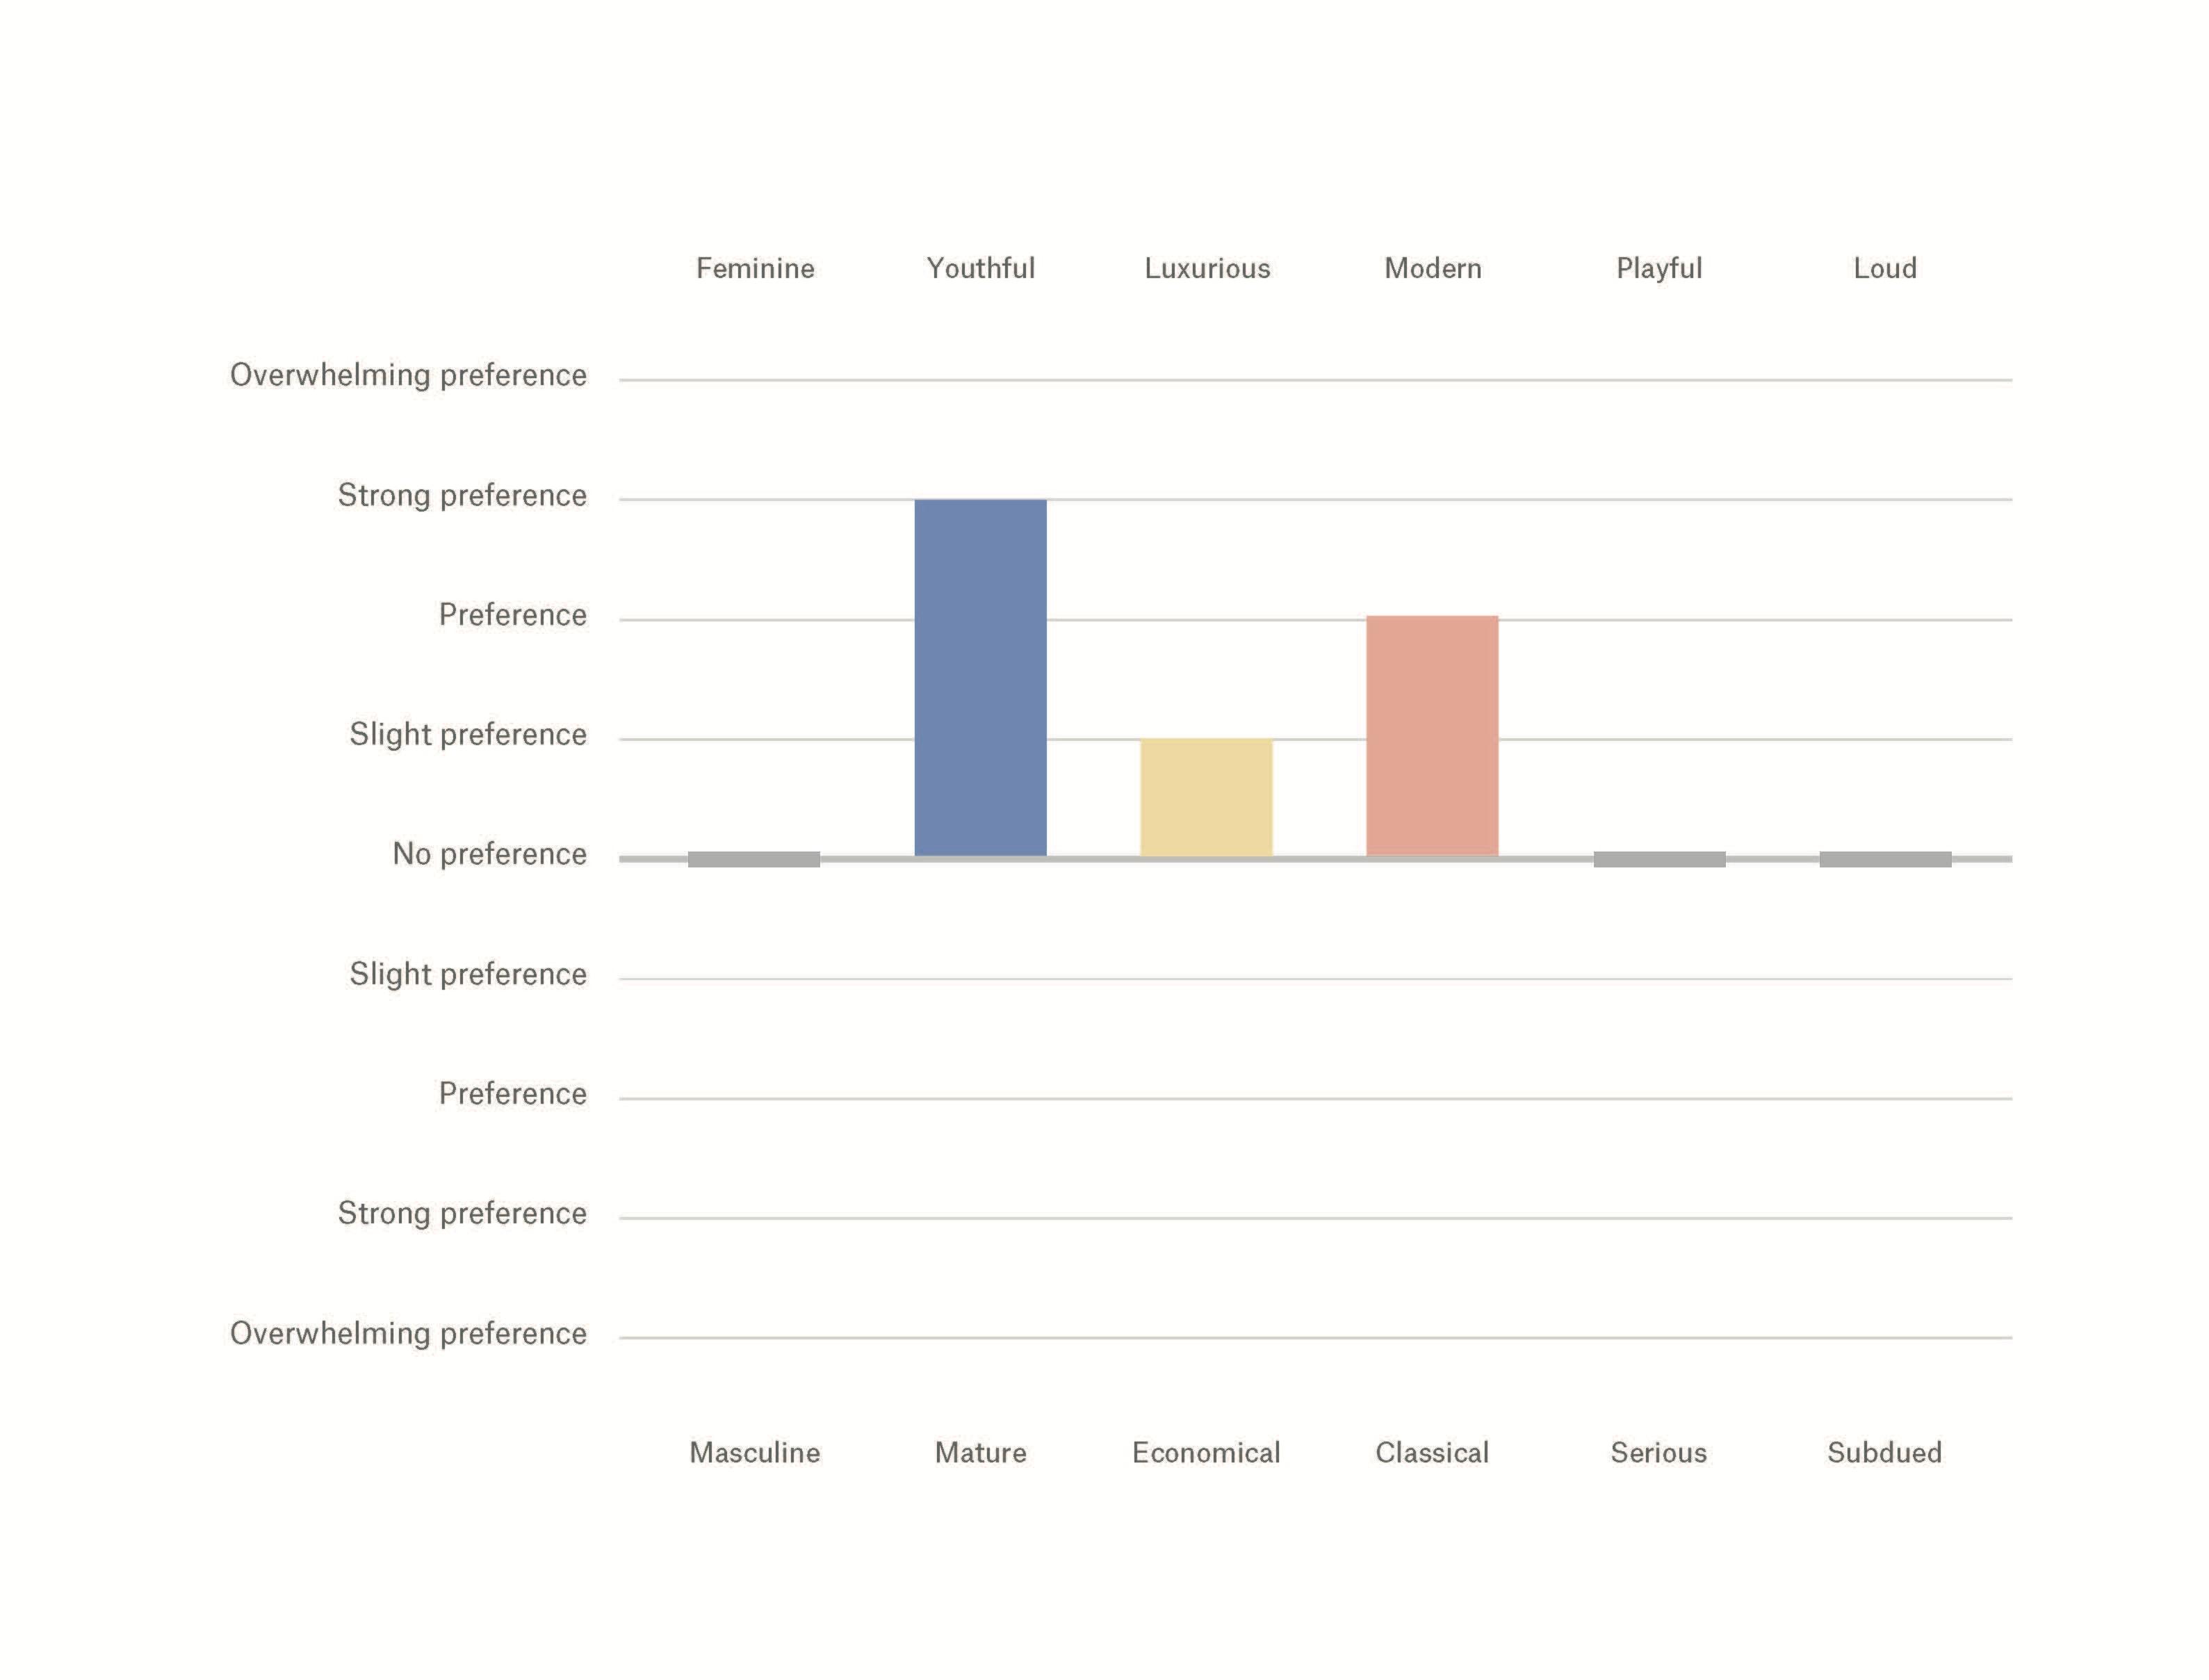 Marketing industry preferred brand personality traits